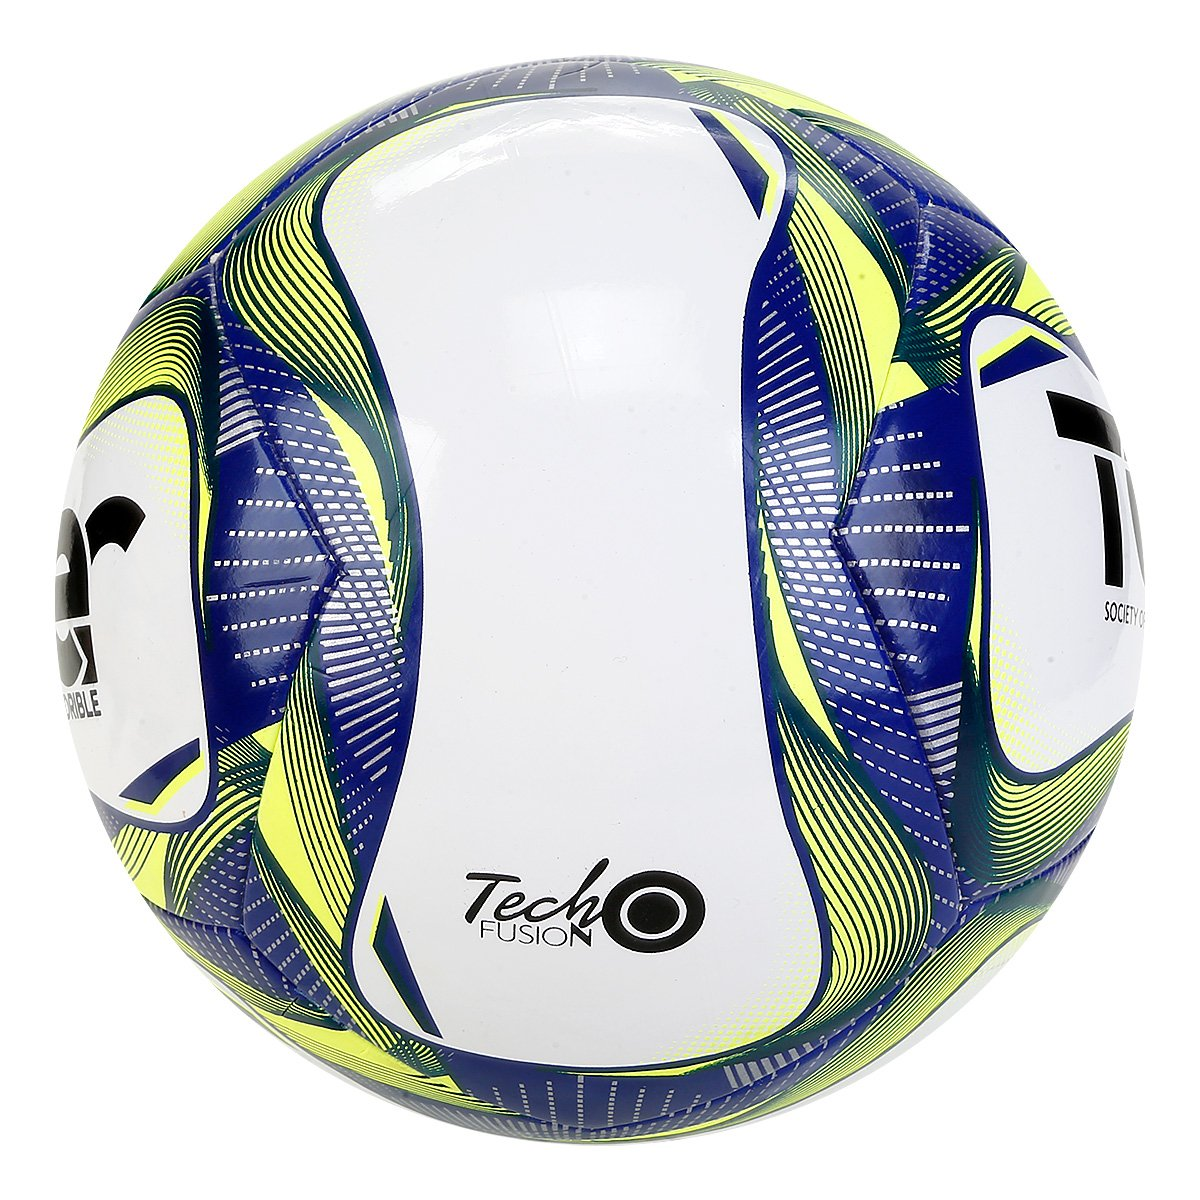 Bola de Futebol Society Topper Drible Tecnofusion - 1